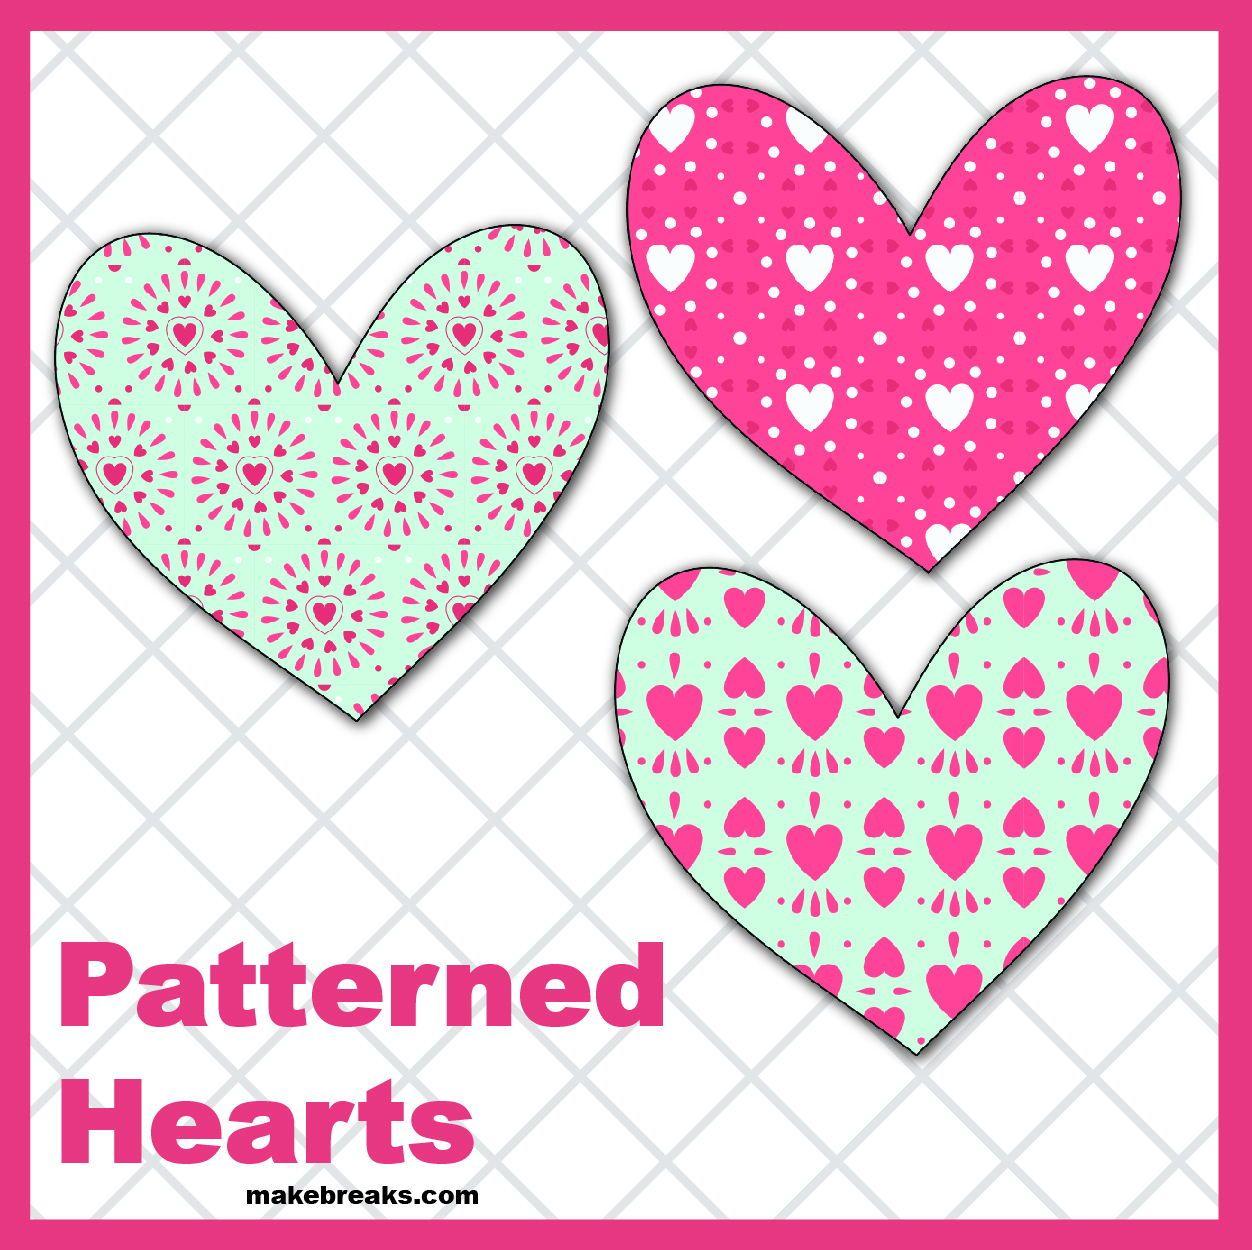 Free Printable Patterned Hearts Make Breaks Valentines Printables Free Valentine Coloring Free Valentine